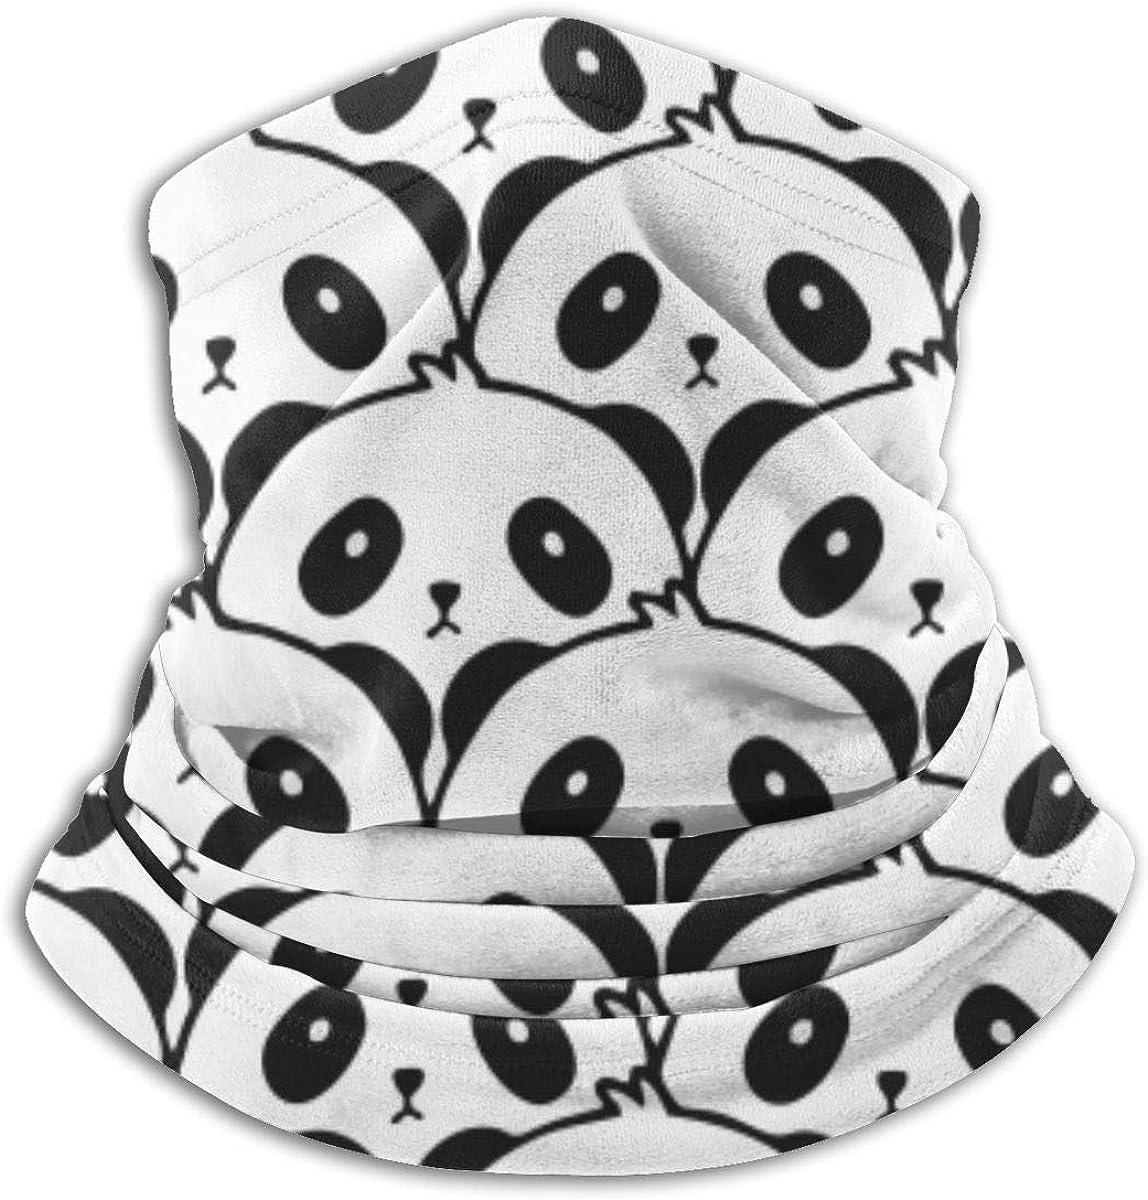 Fashion SARA NELL Neck Gaiter Funny Face Ma Ranking TOP12 Bandana Windproof Panda